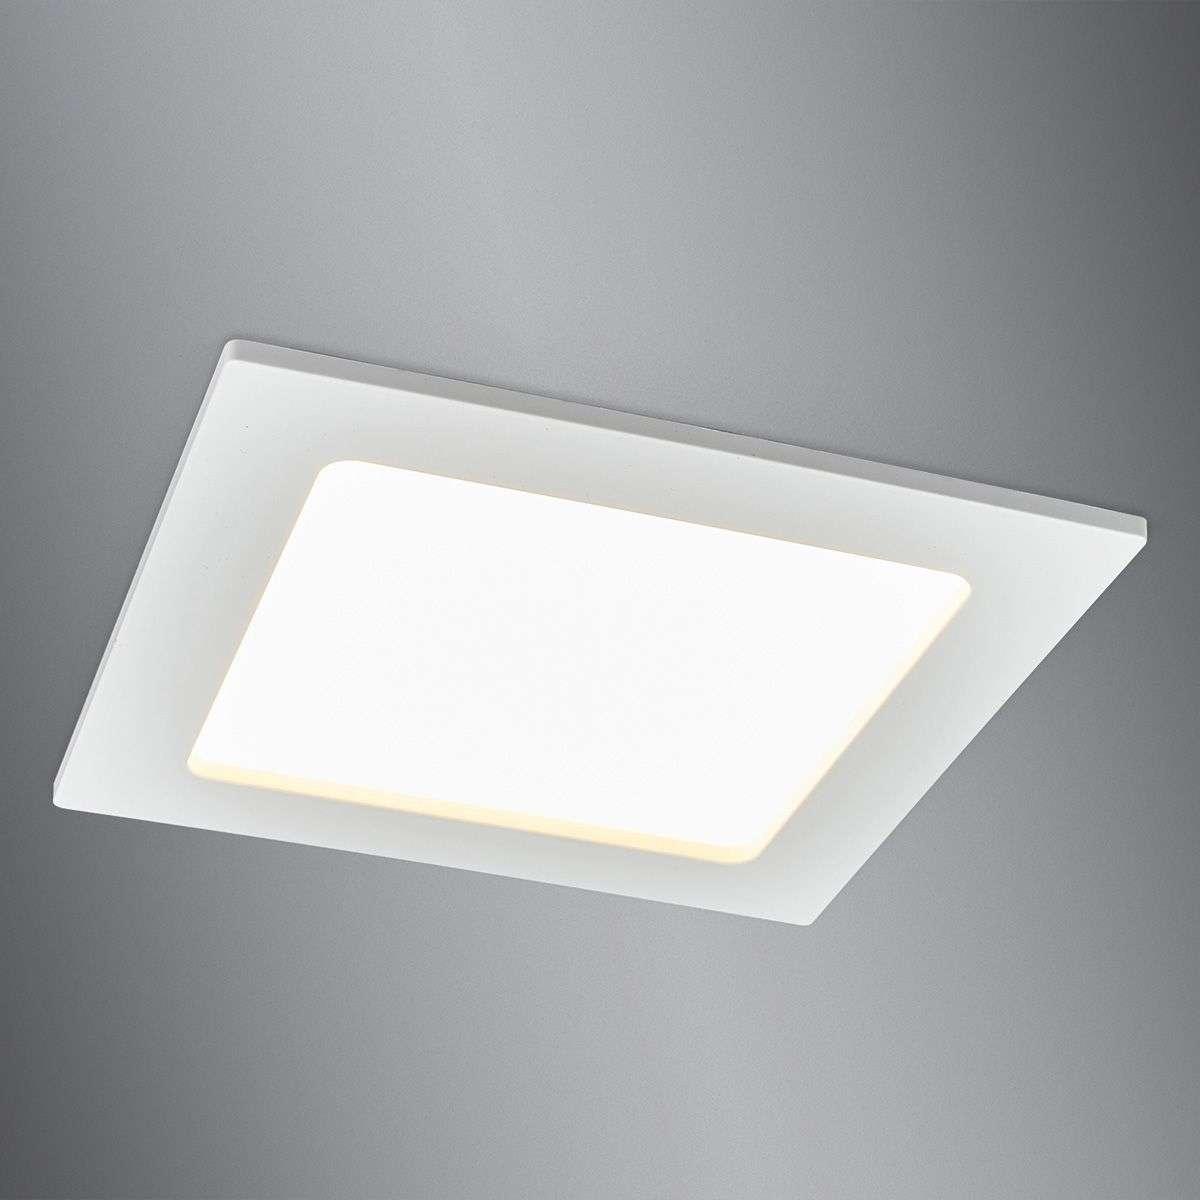 Discreet LED recessed spotlight Feva, 10.5 W   Lights.ie